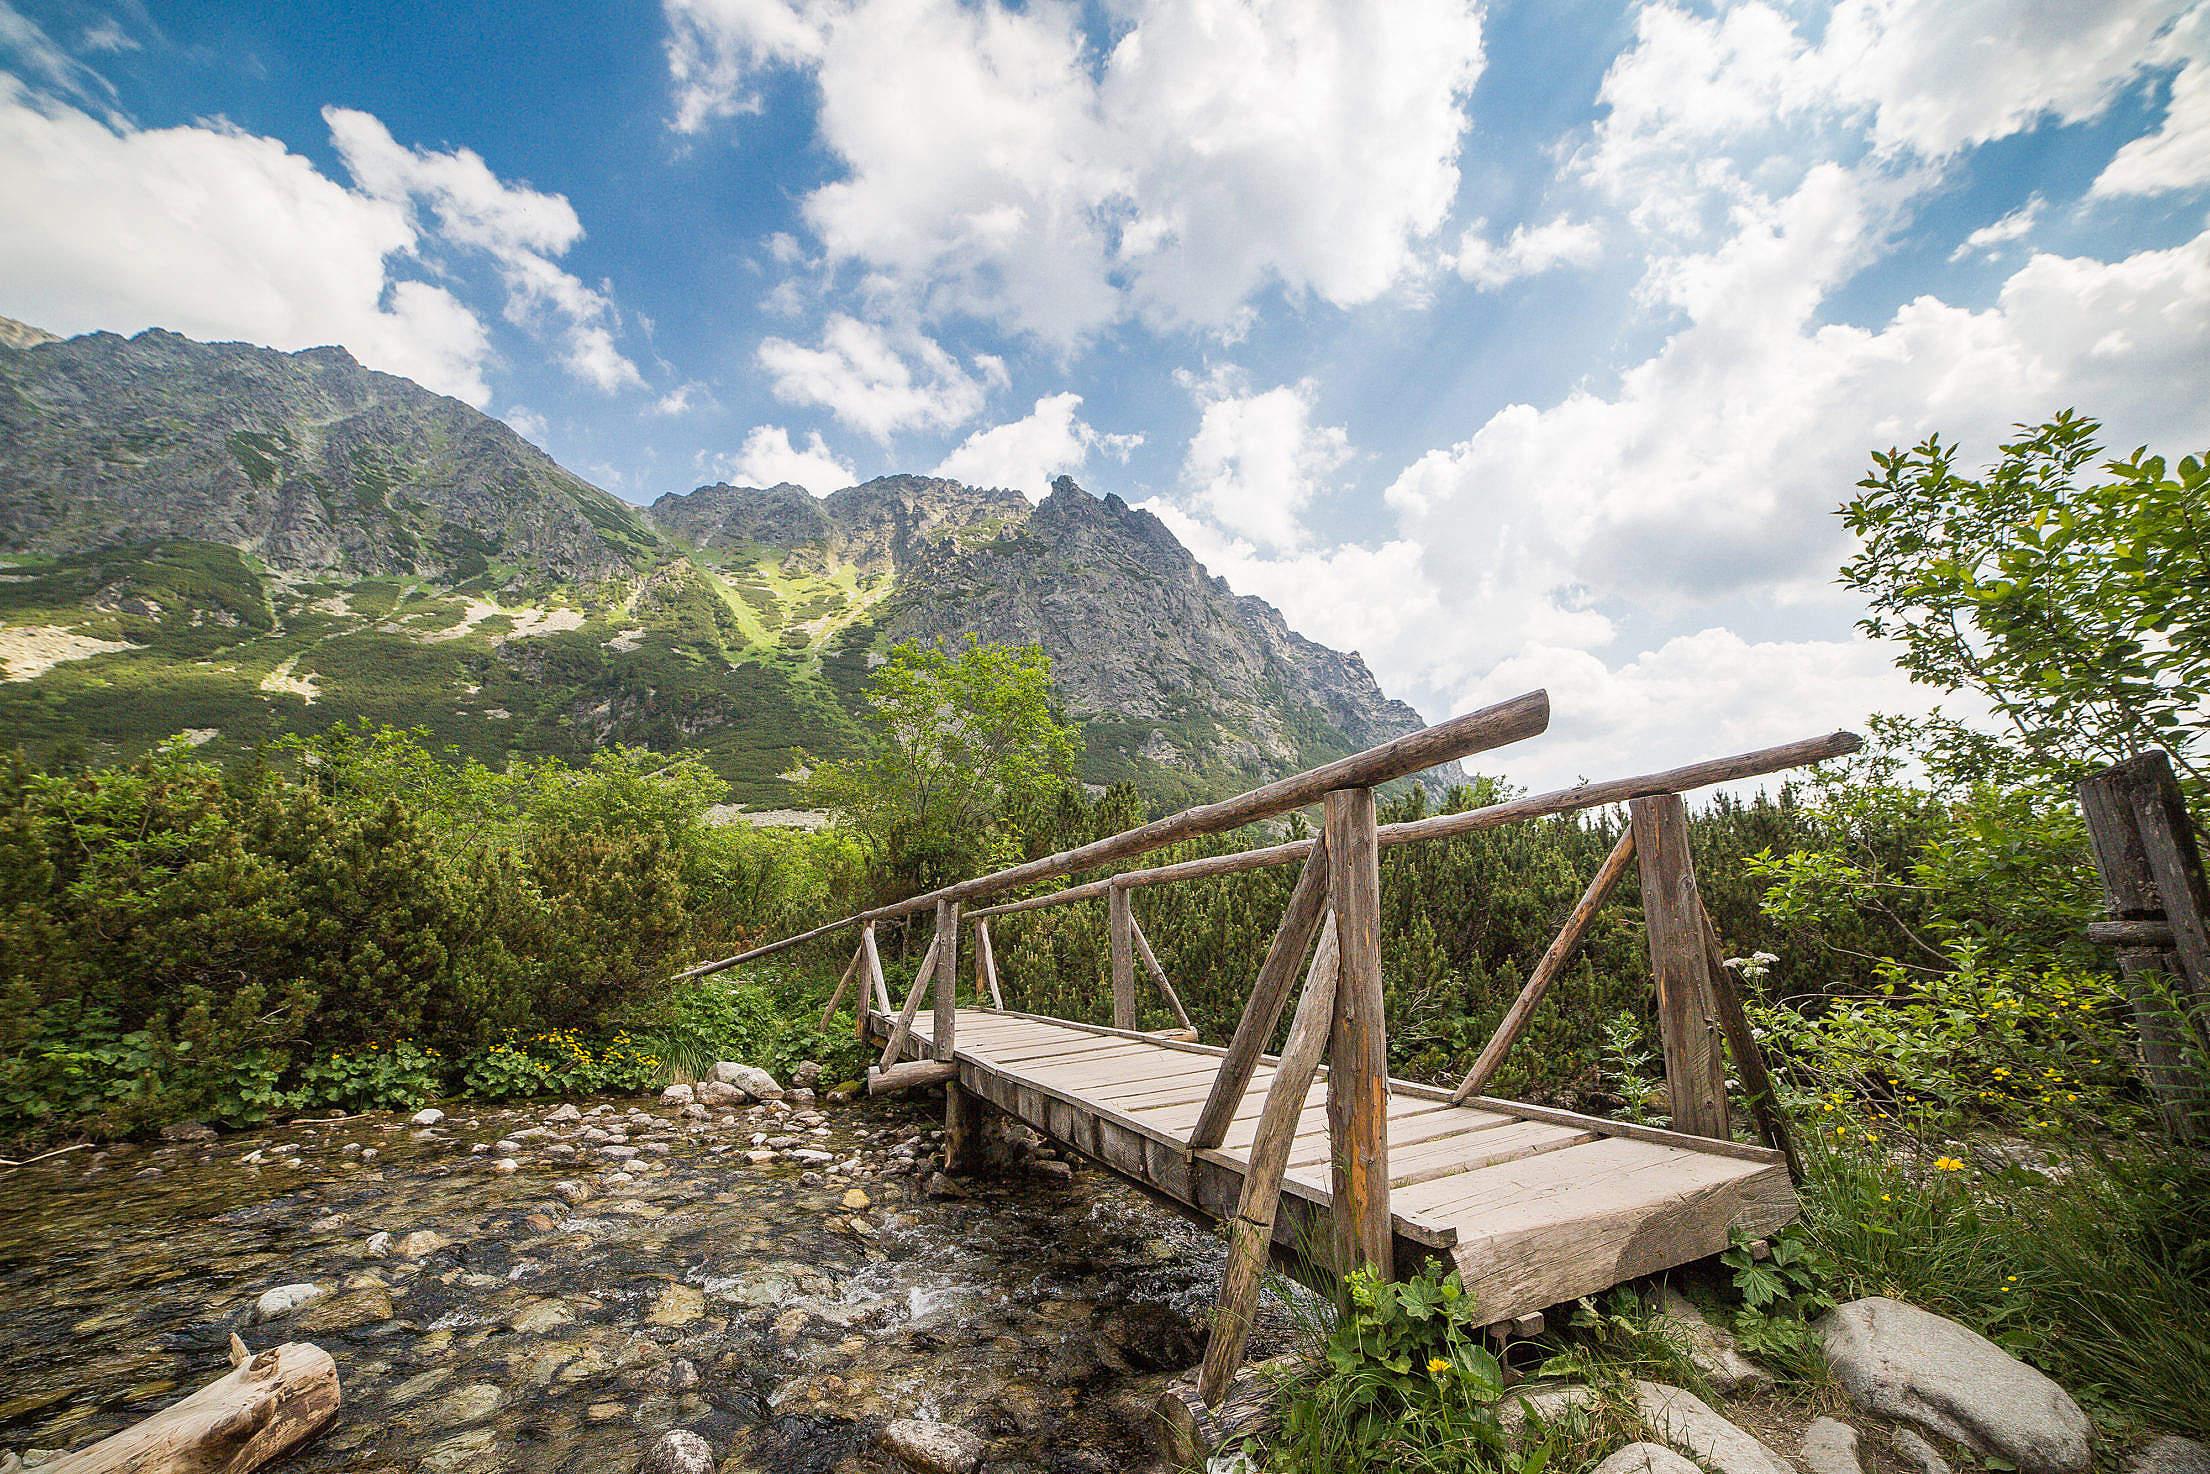 from https://picjumbo.com/wp-content/uploads/wooden-bridge-in-high-tatras-mountains_free_stock_photos_picjumbo_HNCK7678-2210x1474.jpg